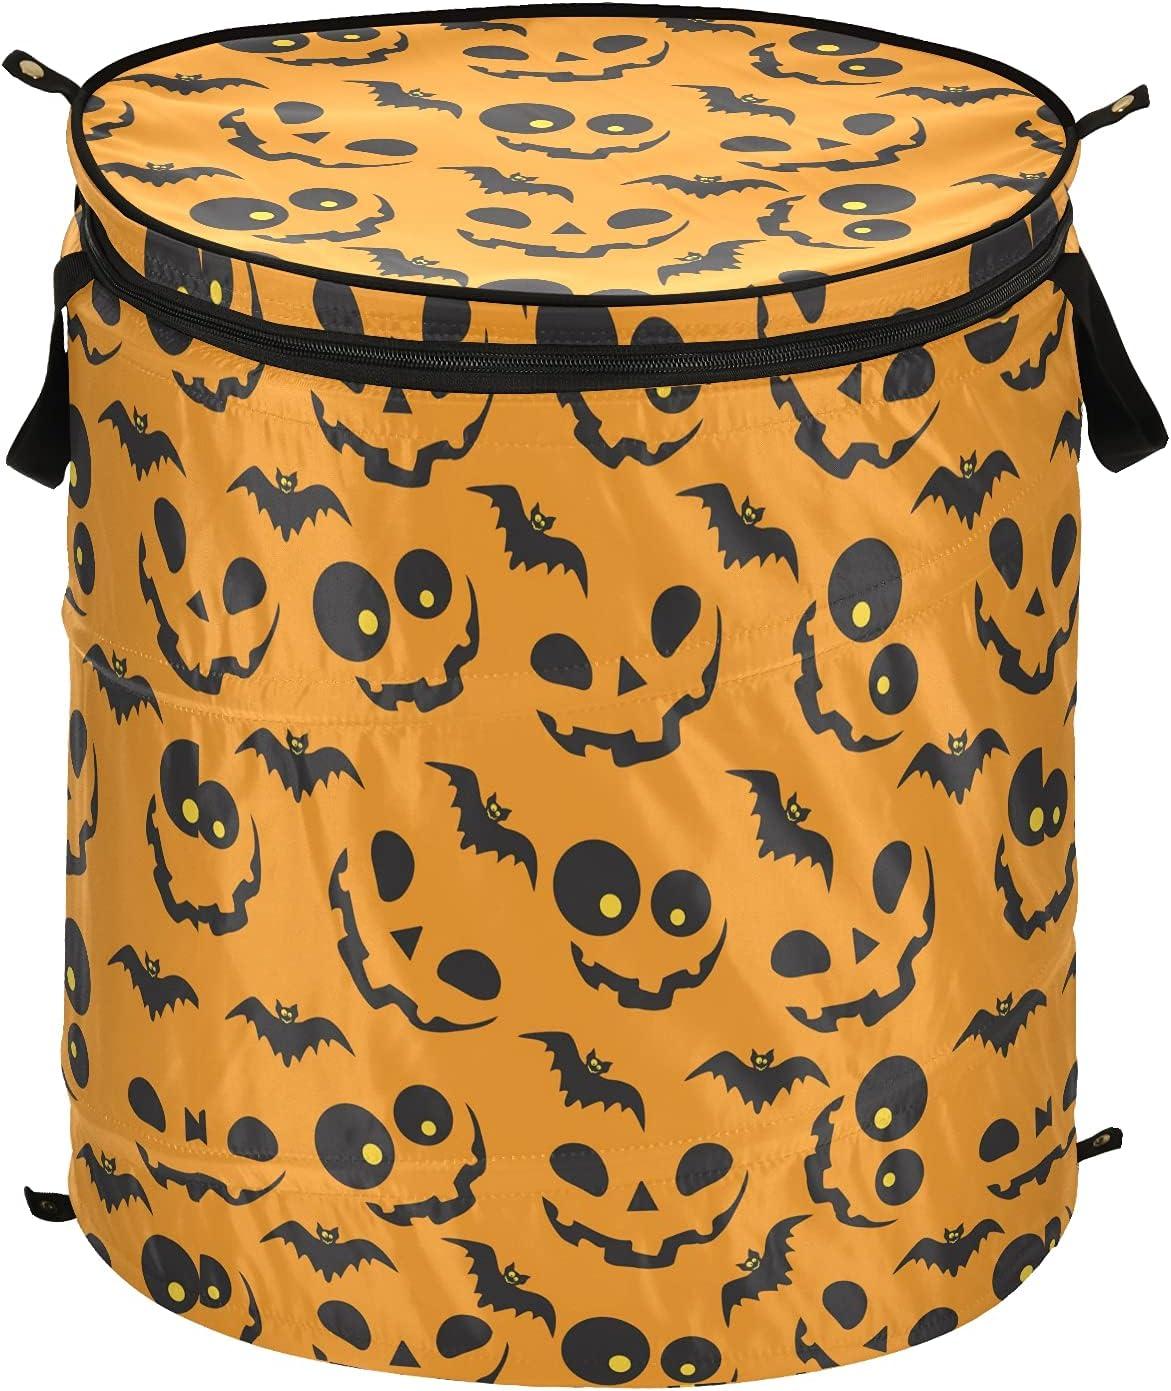 Halloween Orange Pumpkins Bats Pop Up 100% Elegant quality warranty Lid Hamper with Fo Laundry